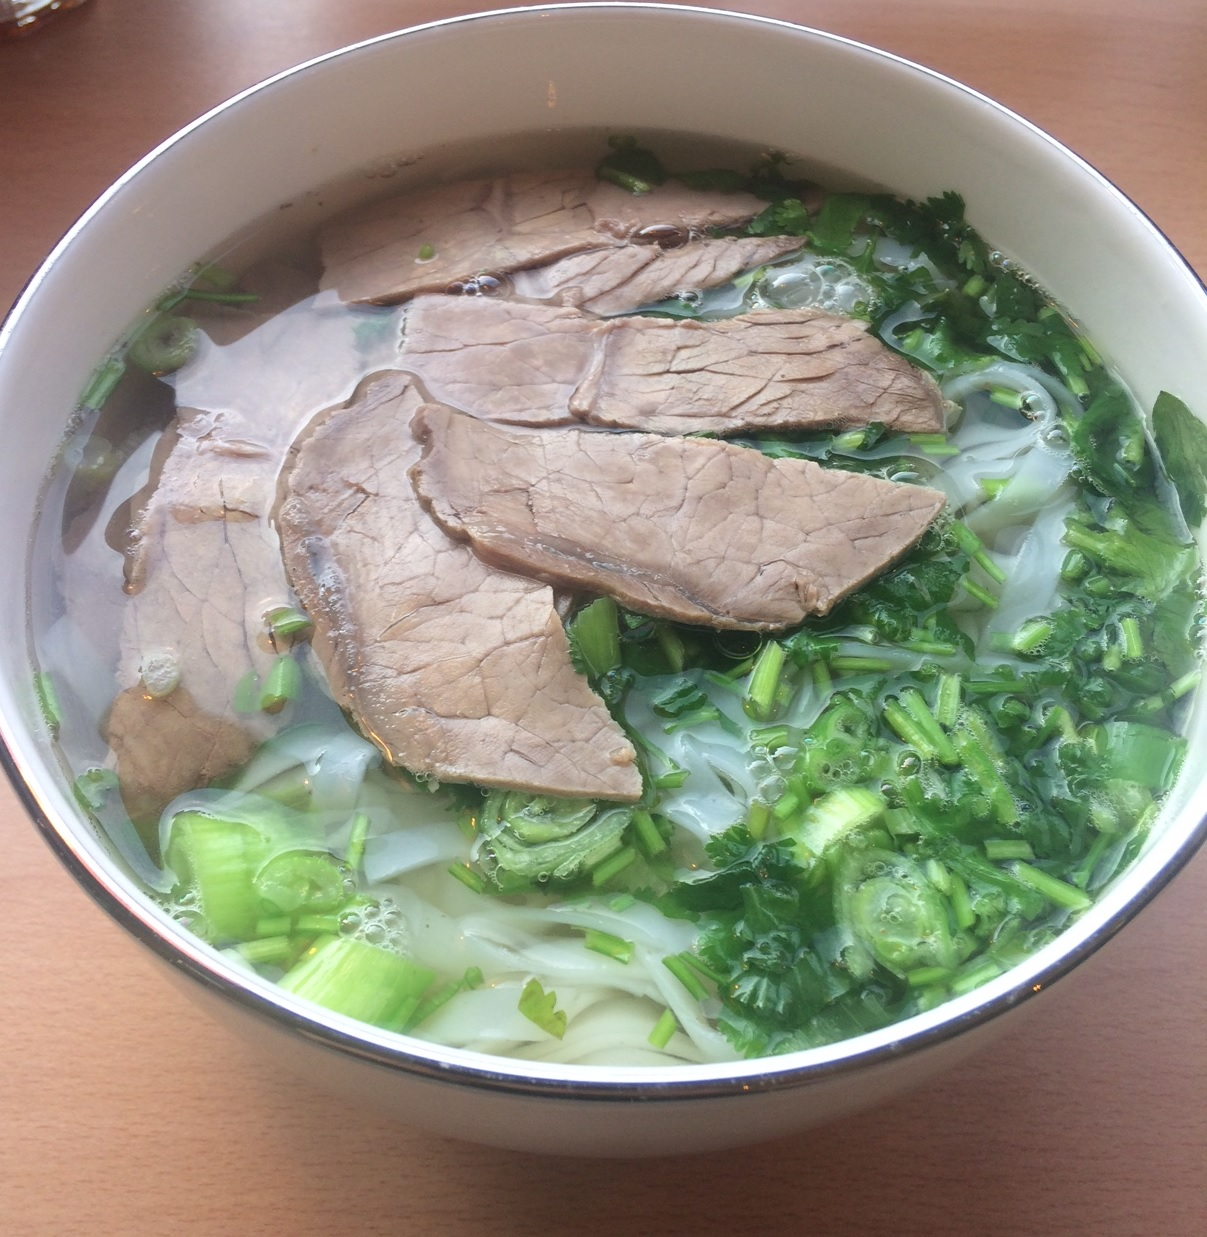 Slurping Bowls of Pho at the Bun Mii Vietnamese cafe